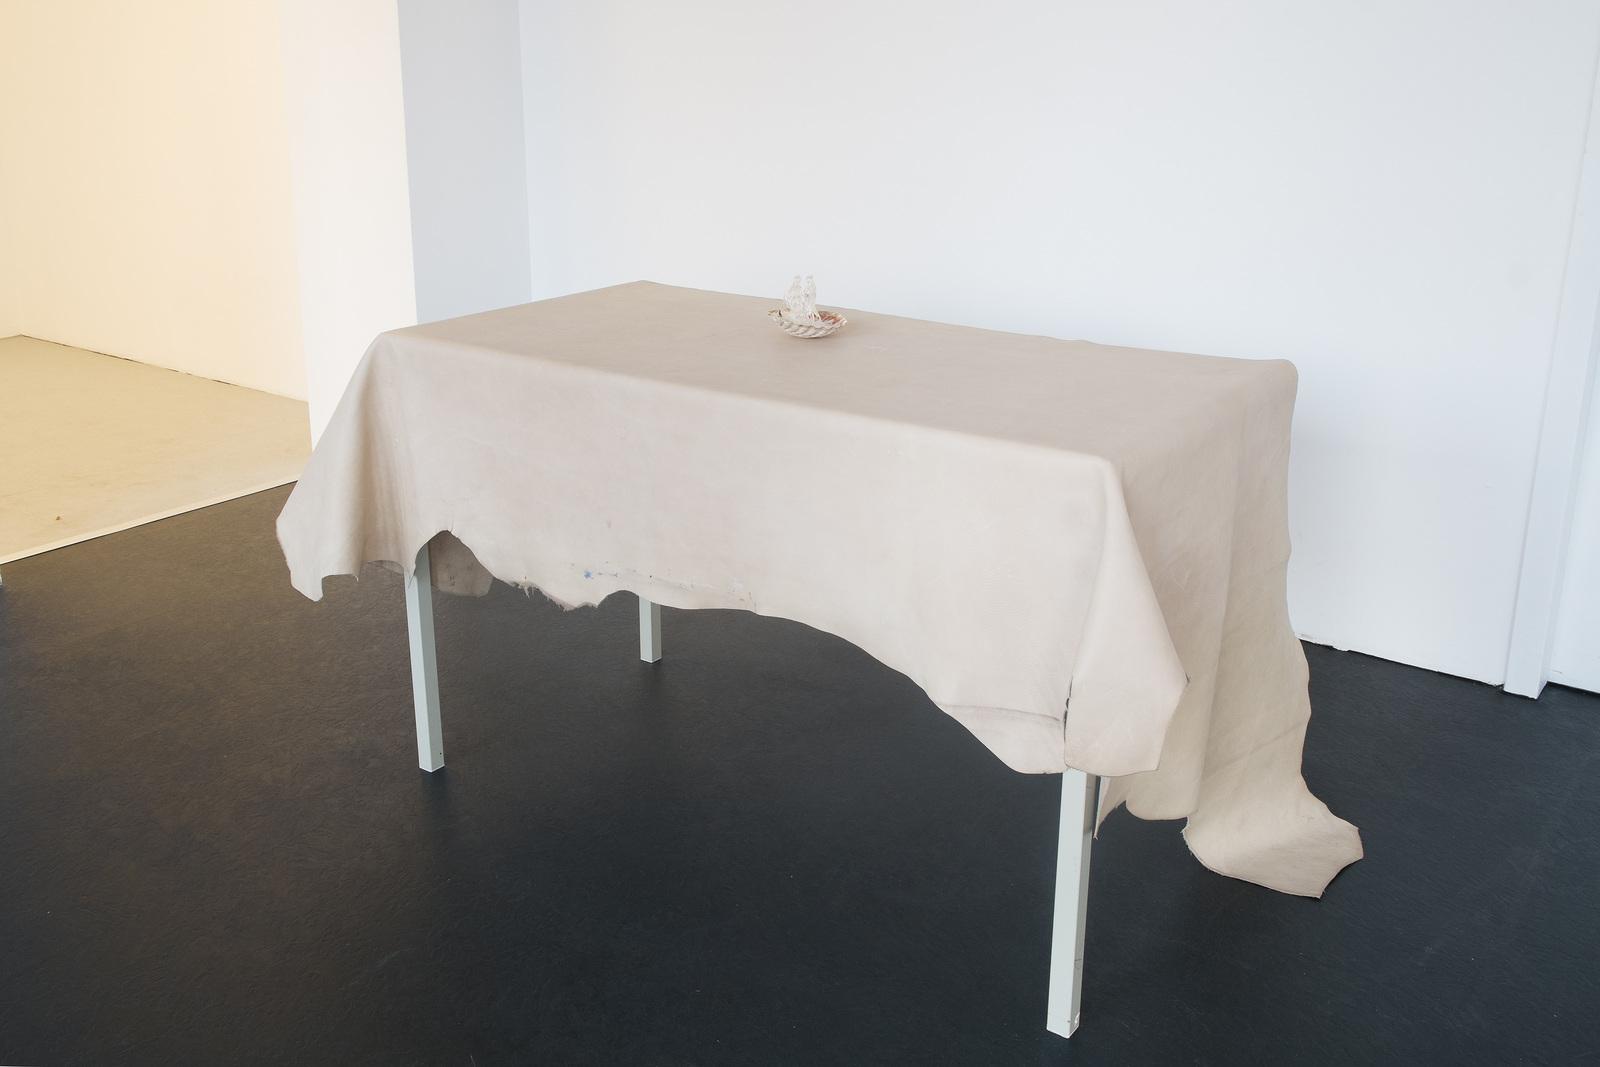 3_Sam Anderson_Desk Set_ICHTS_2016_Dortmunder Kunstverein_Foto Niklas Taleb